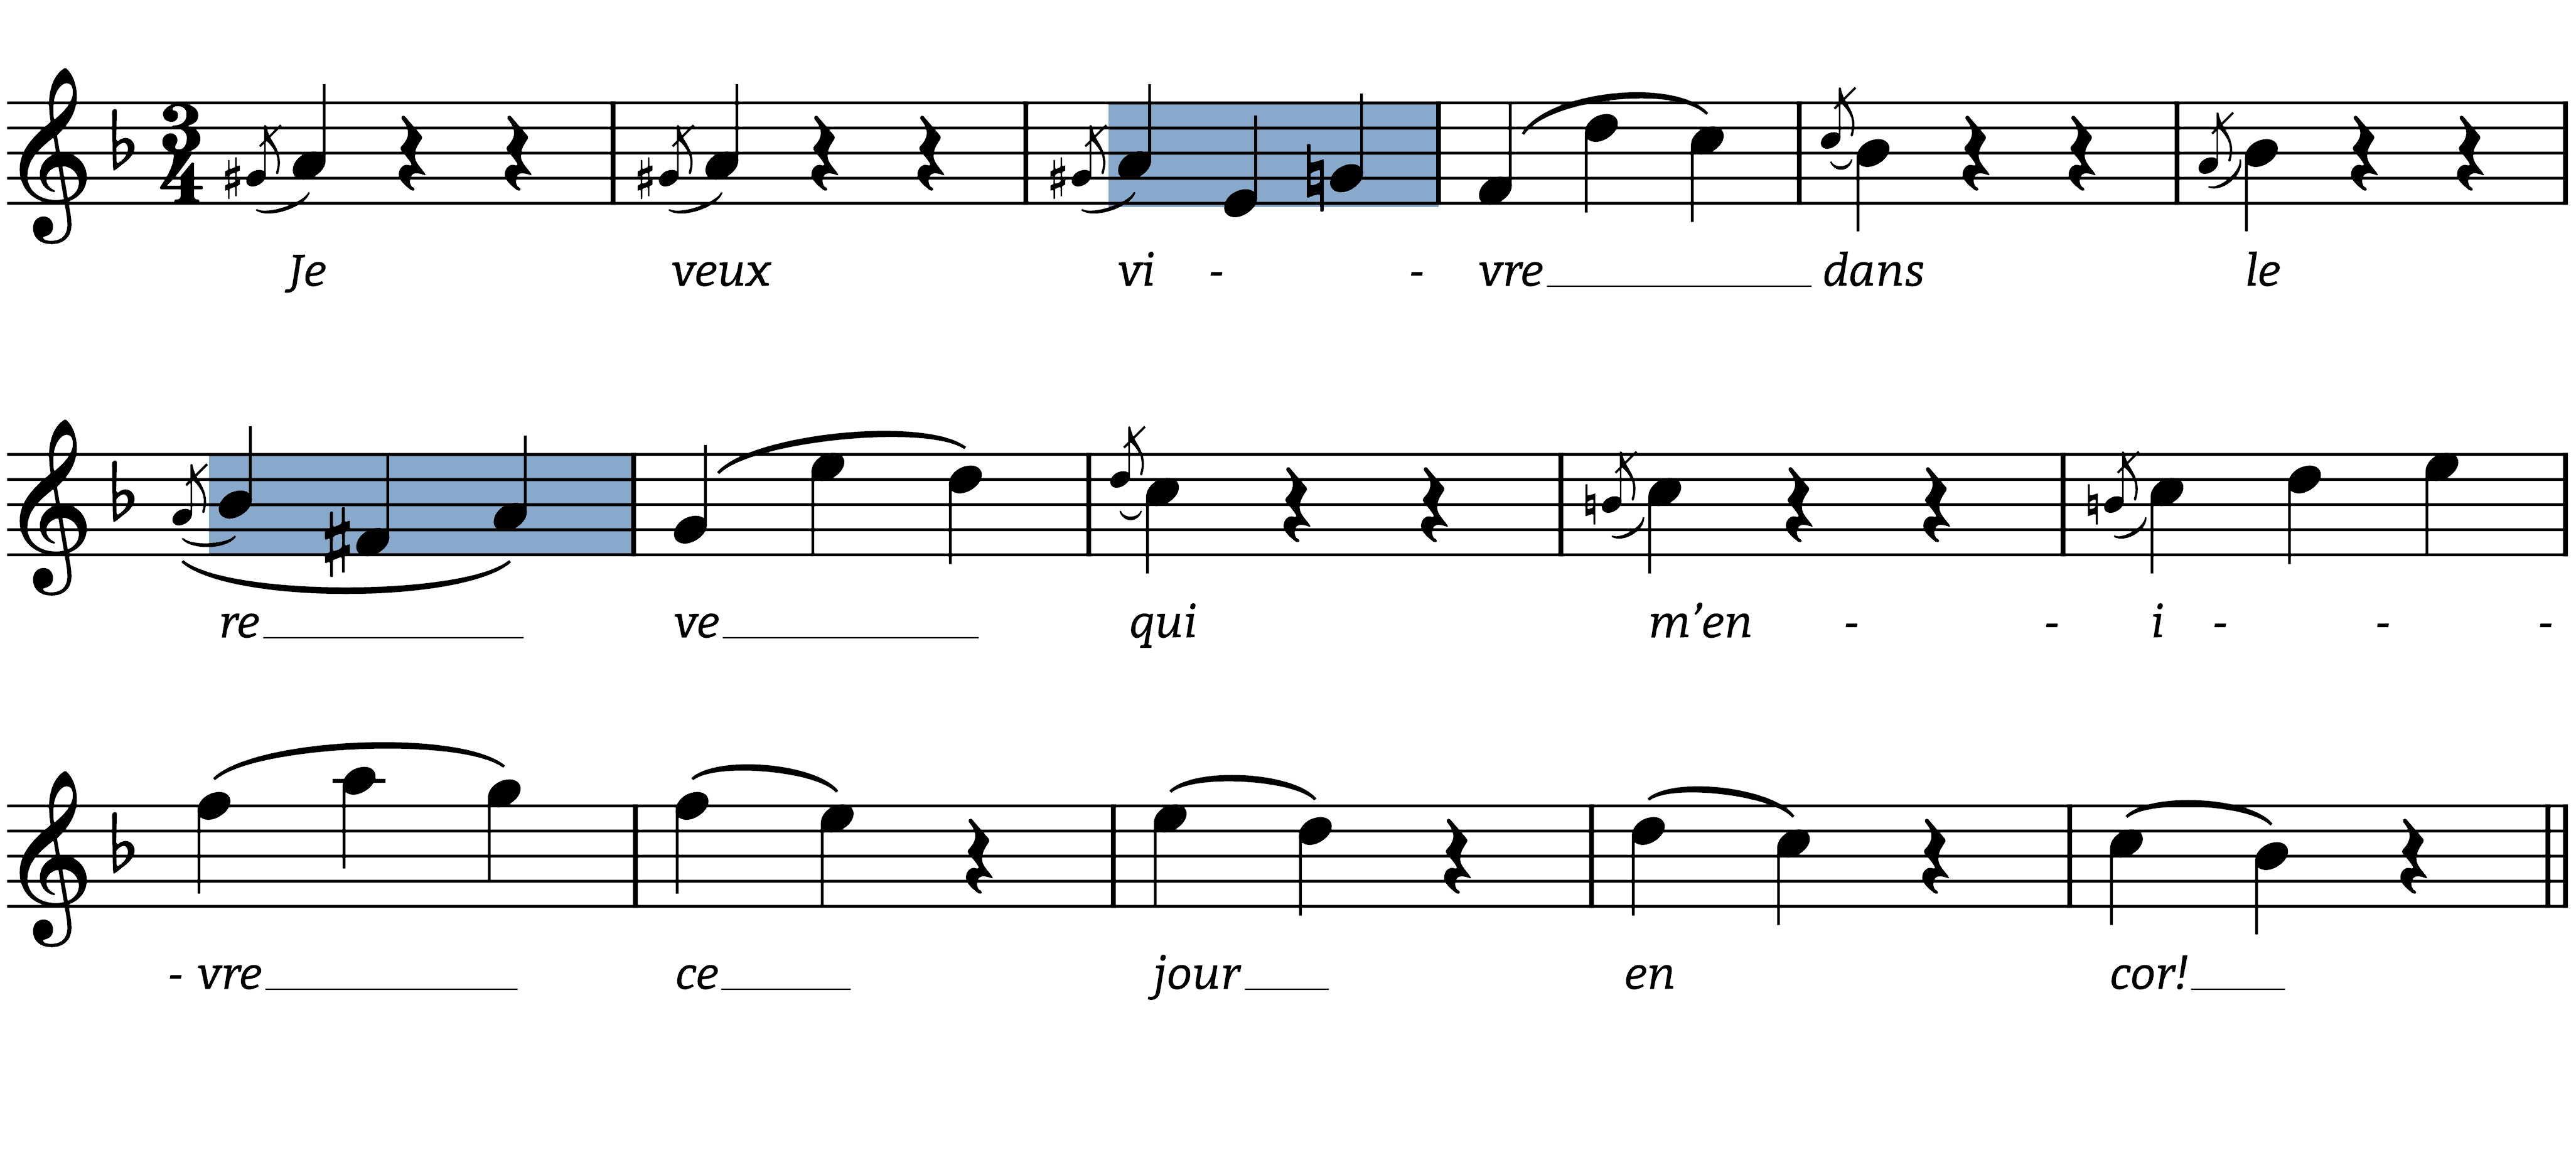 juliets-waltz melodic figures